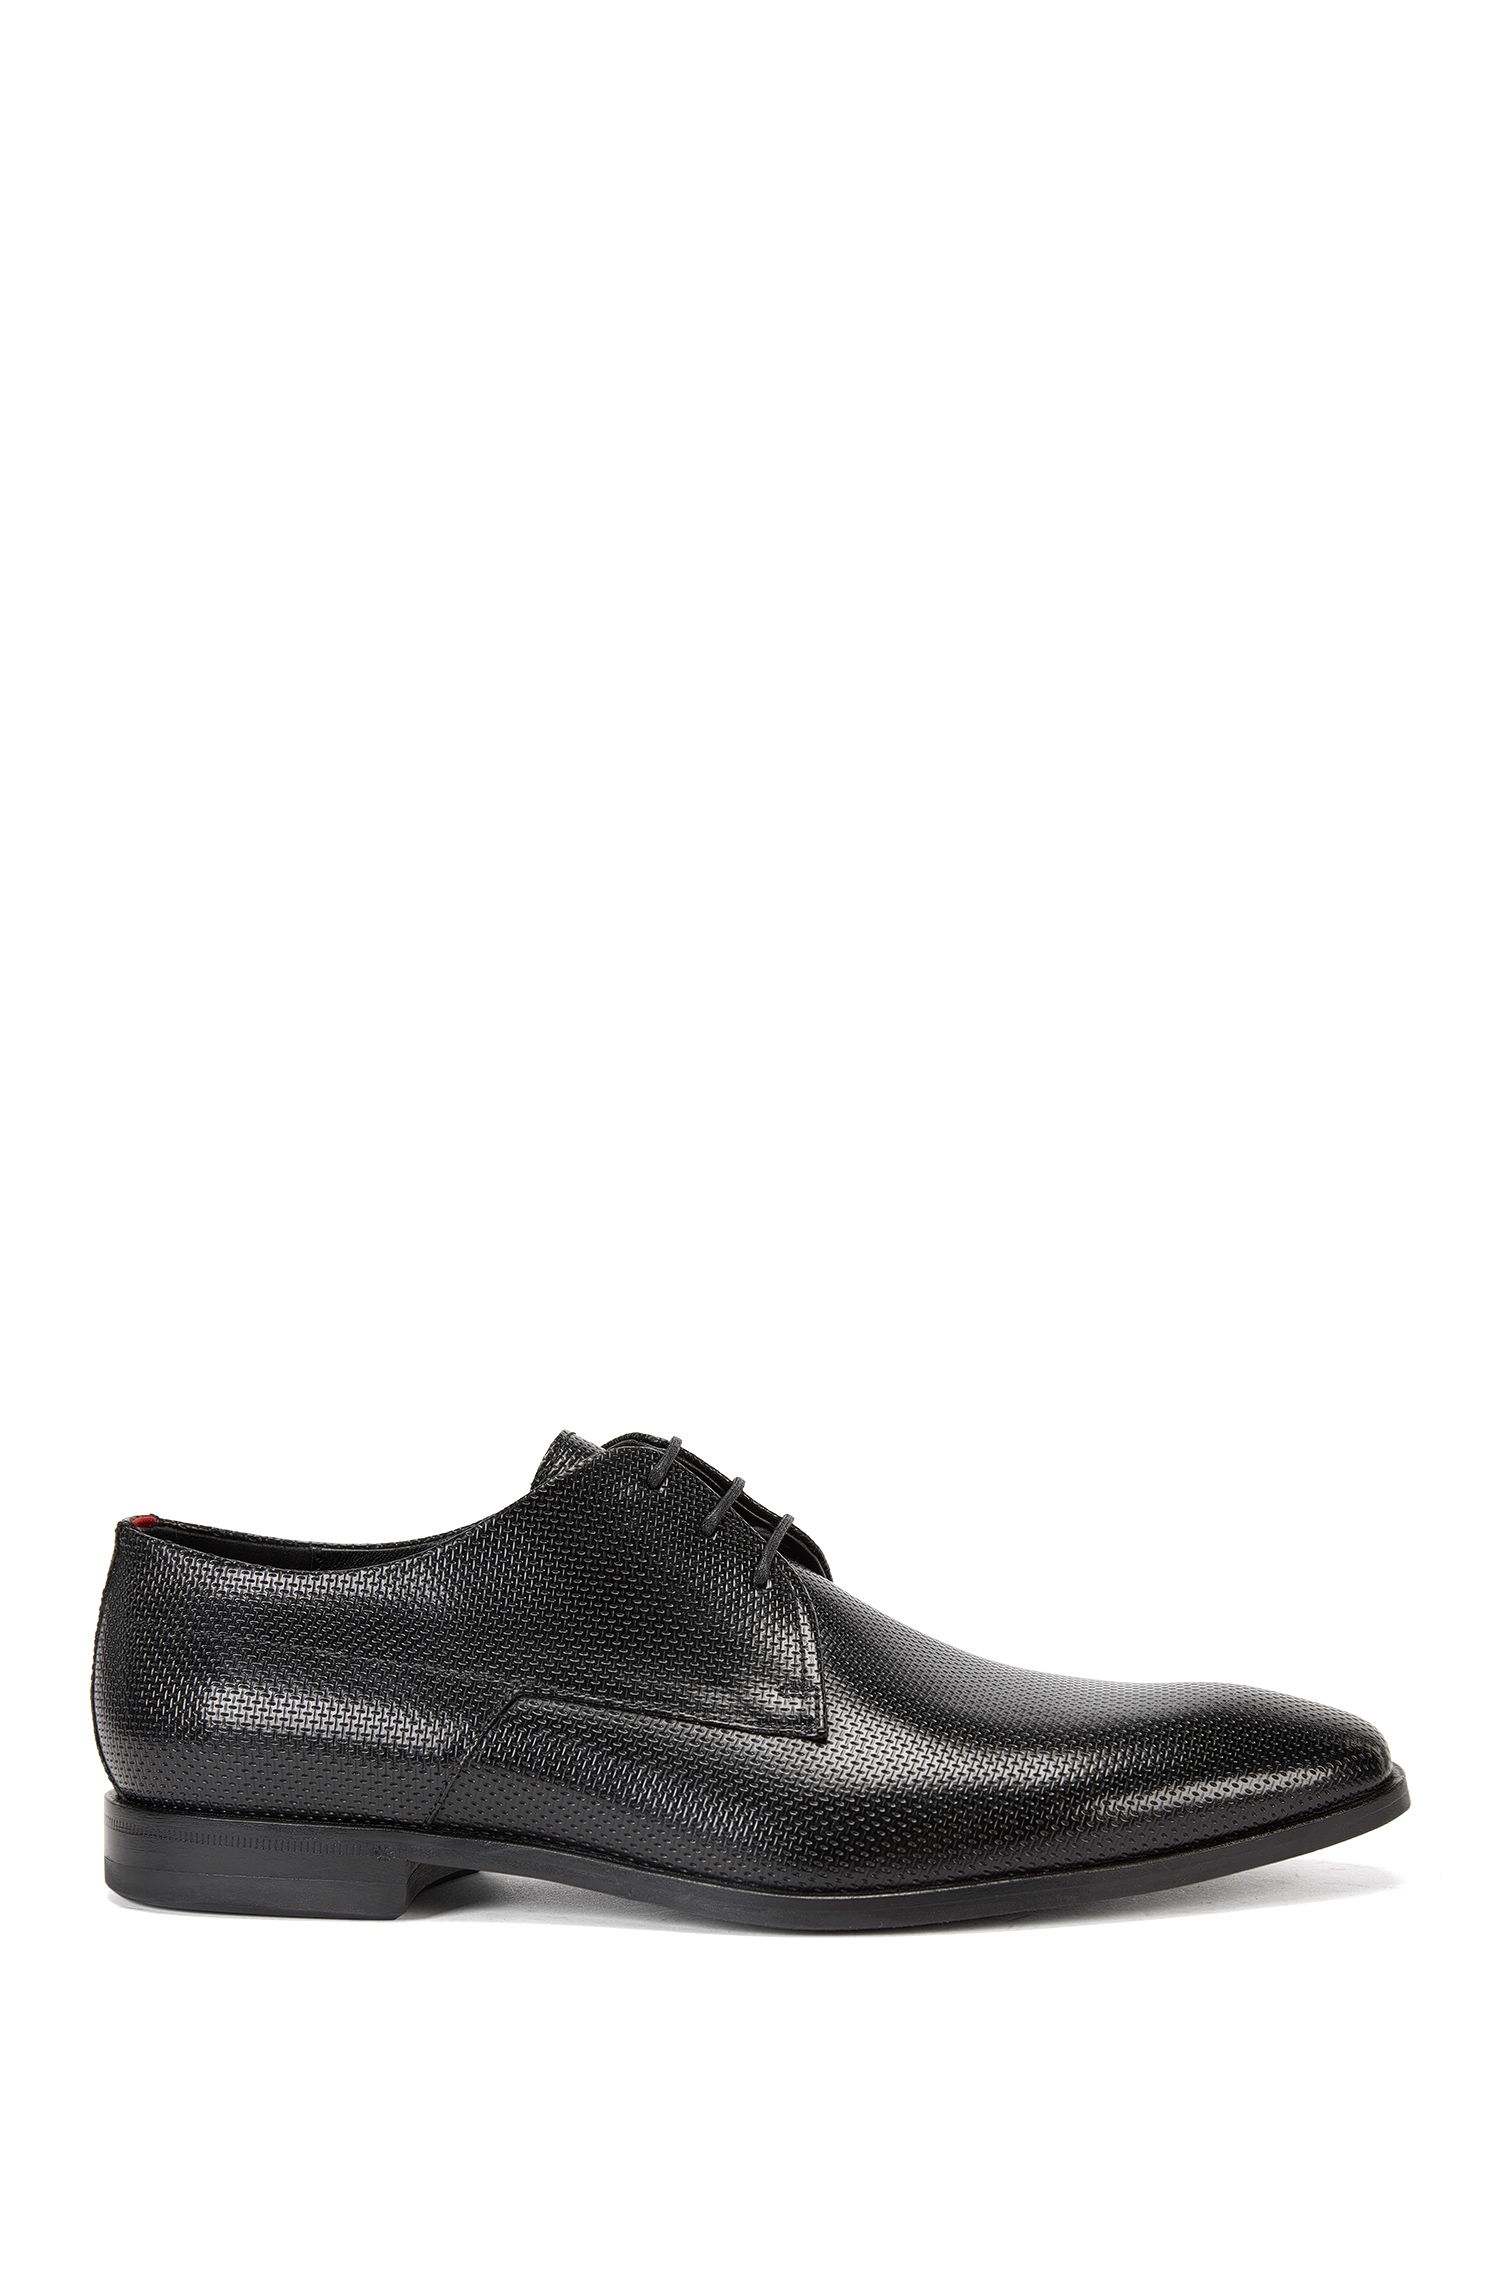 Mesh-Embossed Leather Derby Dress Shoes | Square Derb Bopr